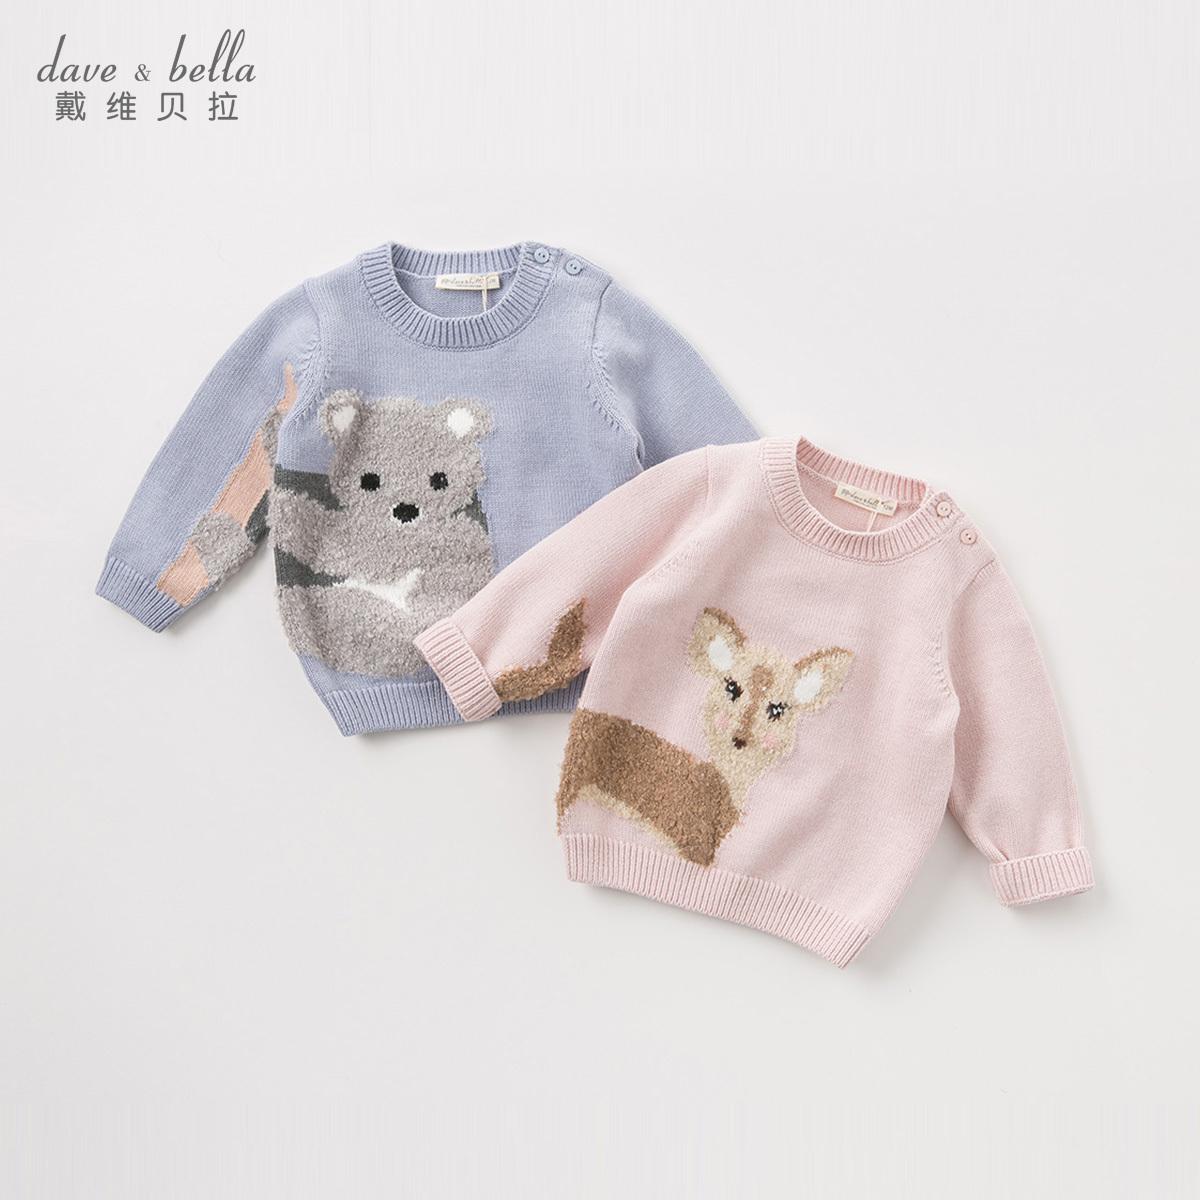 davebella戴维贝拉2018秋冬装新款儿童针织衫 宝宝卡通毛衣DB8256